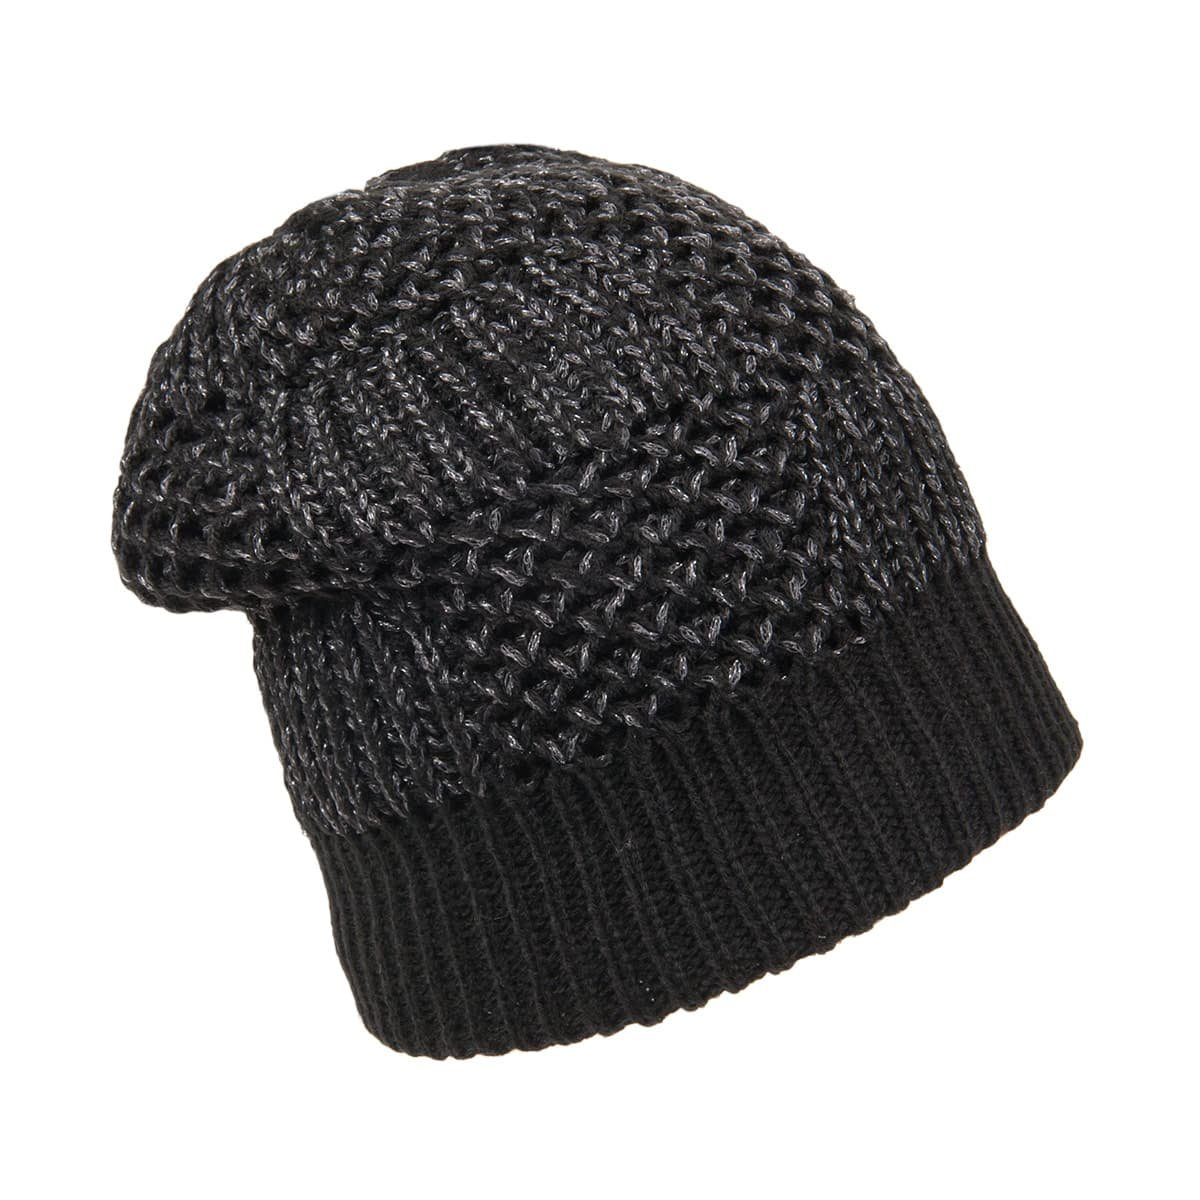 55d335bdf3 cuffia donna in lana maglia, EUR 16,90 -->